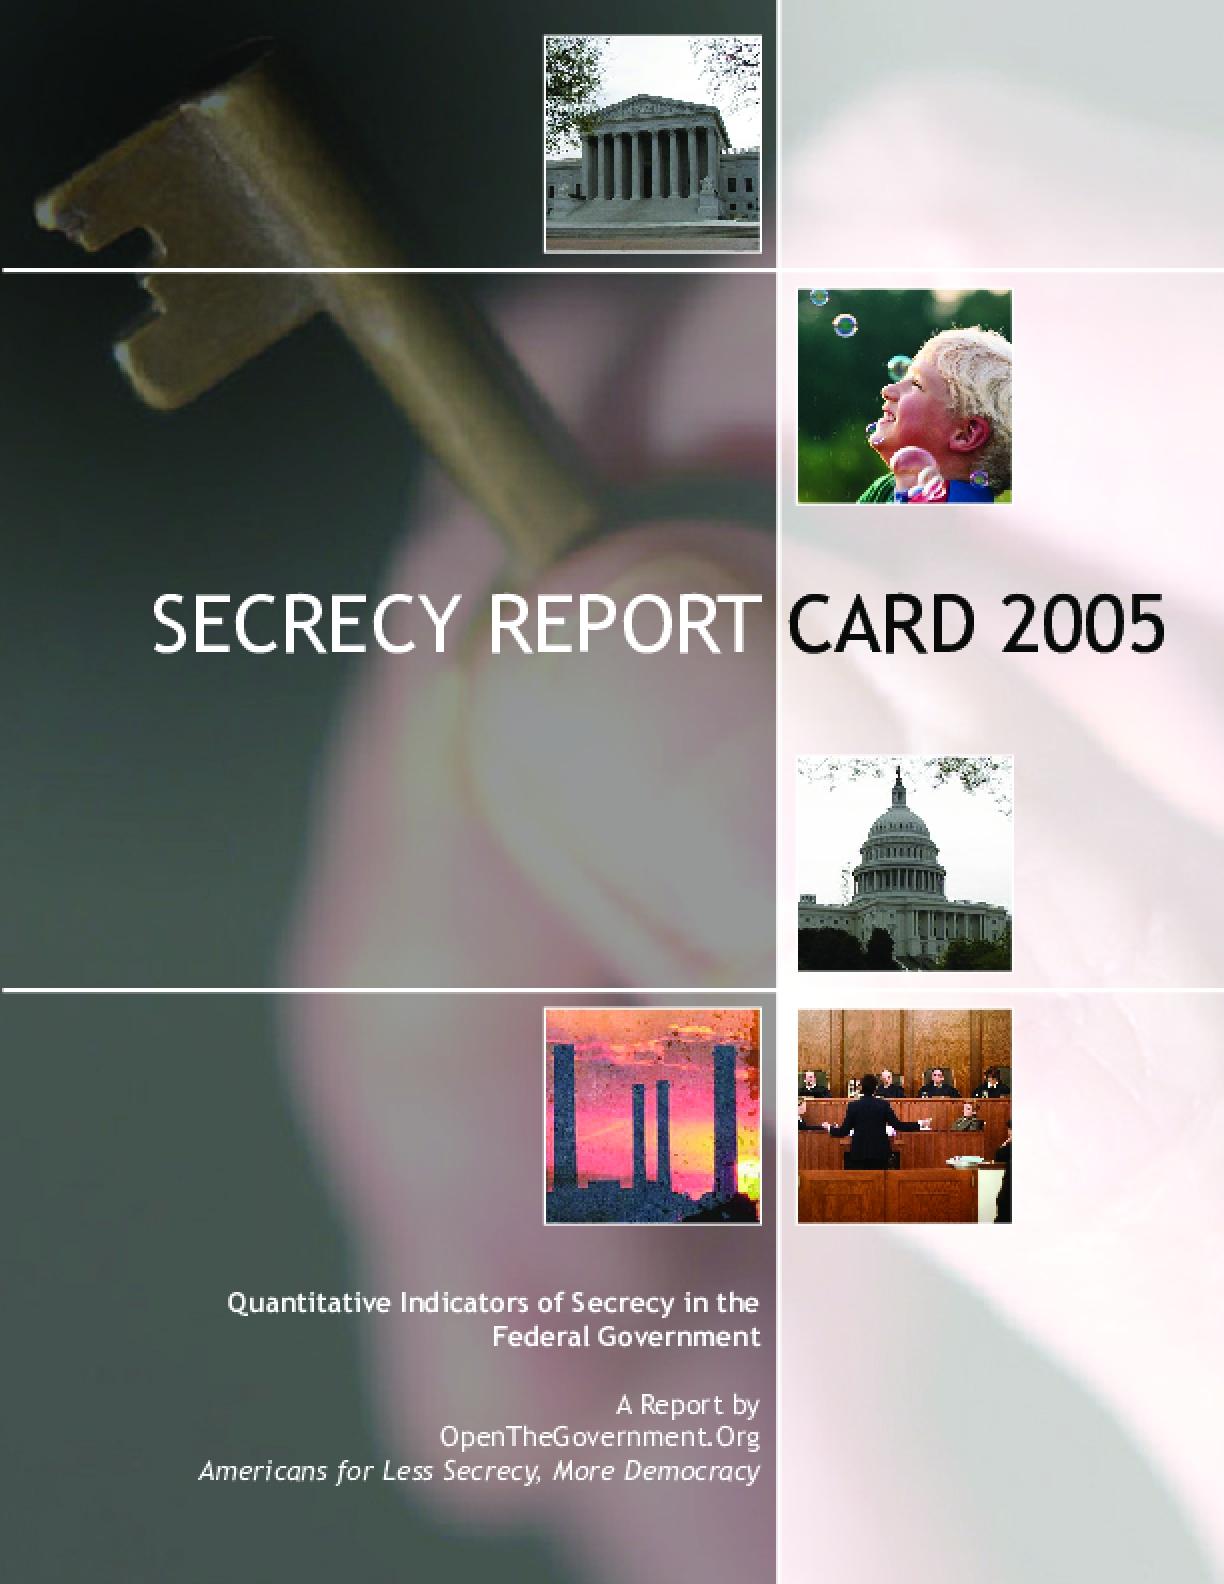 Secrecy Report Card 2005